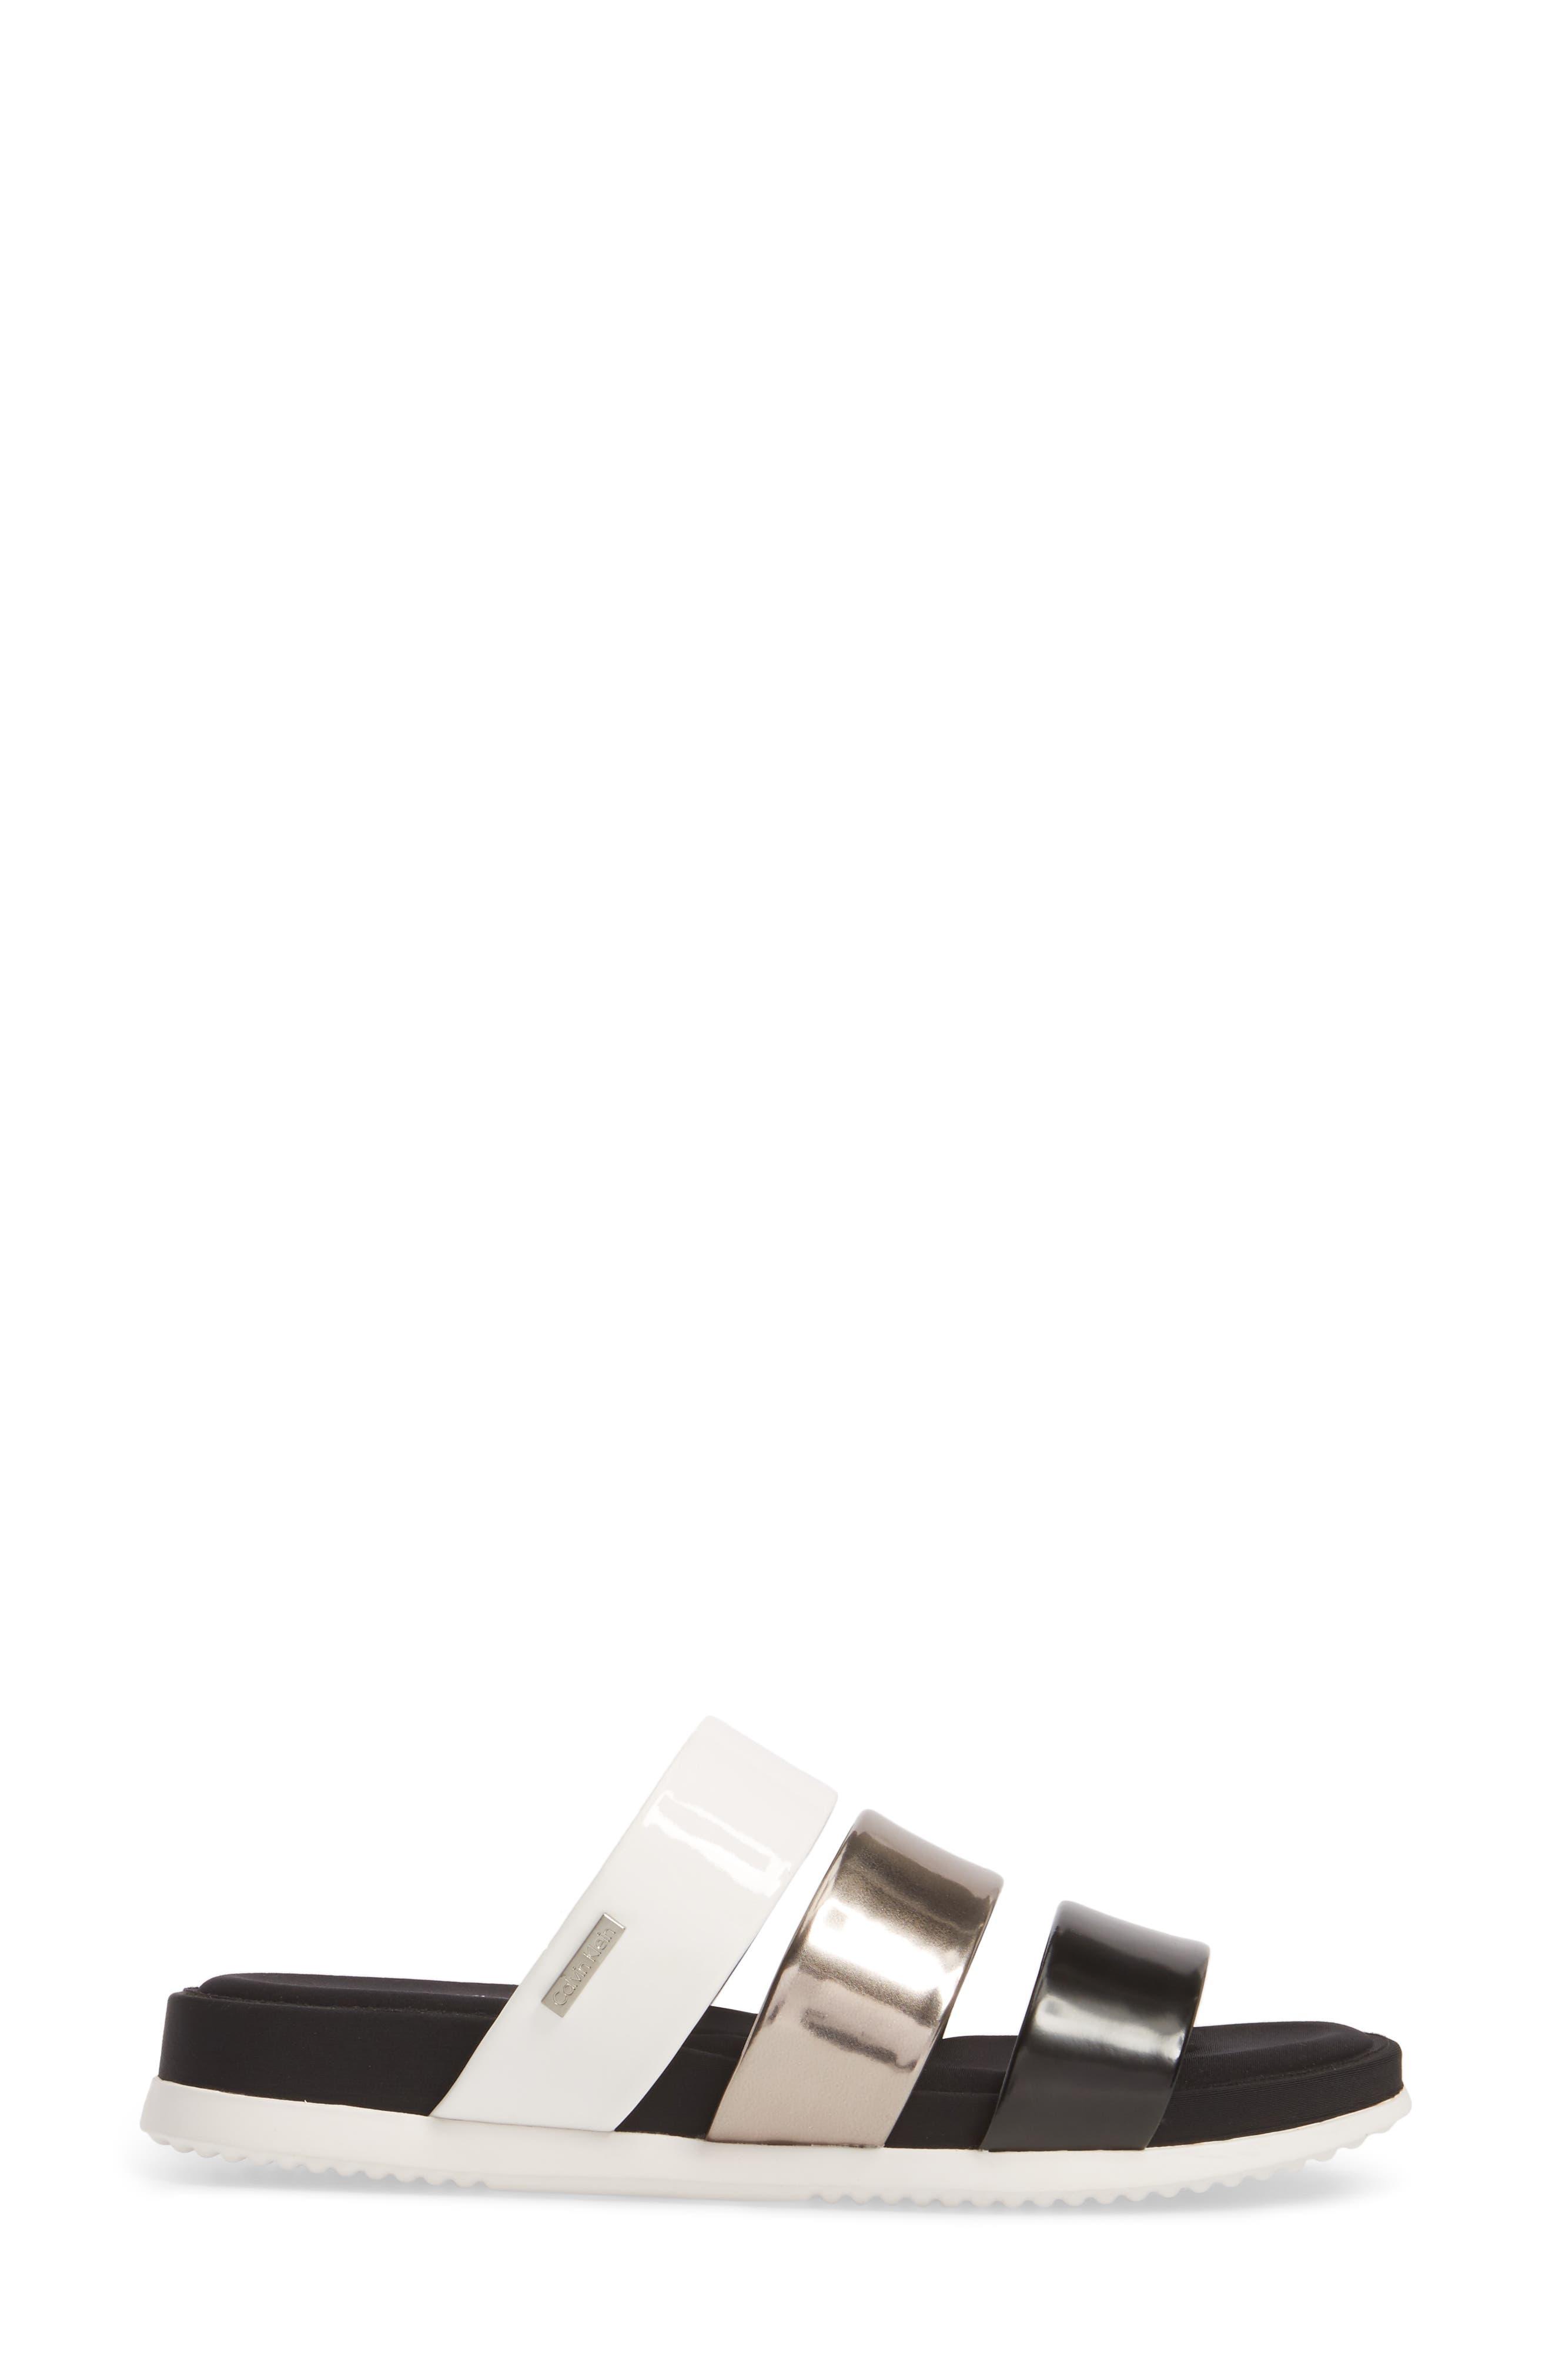 Dalana Slide Sandal,                             Alternate thumbnail 3, color,                             Black/ Pewter Faux Leather